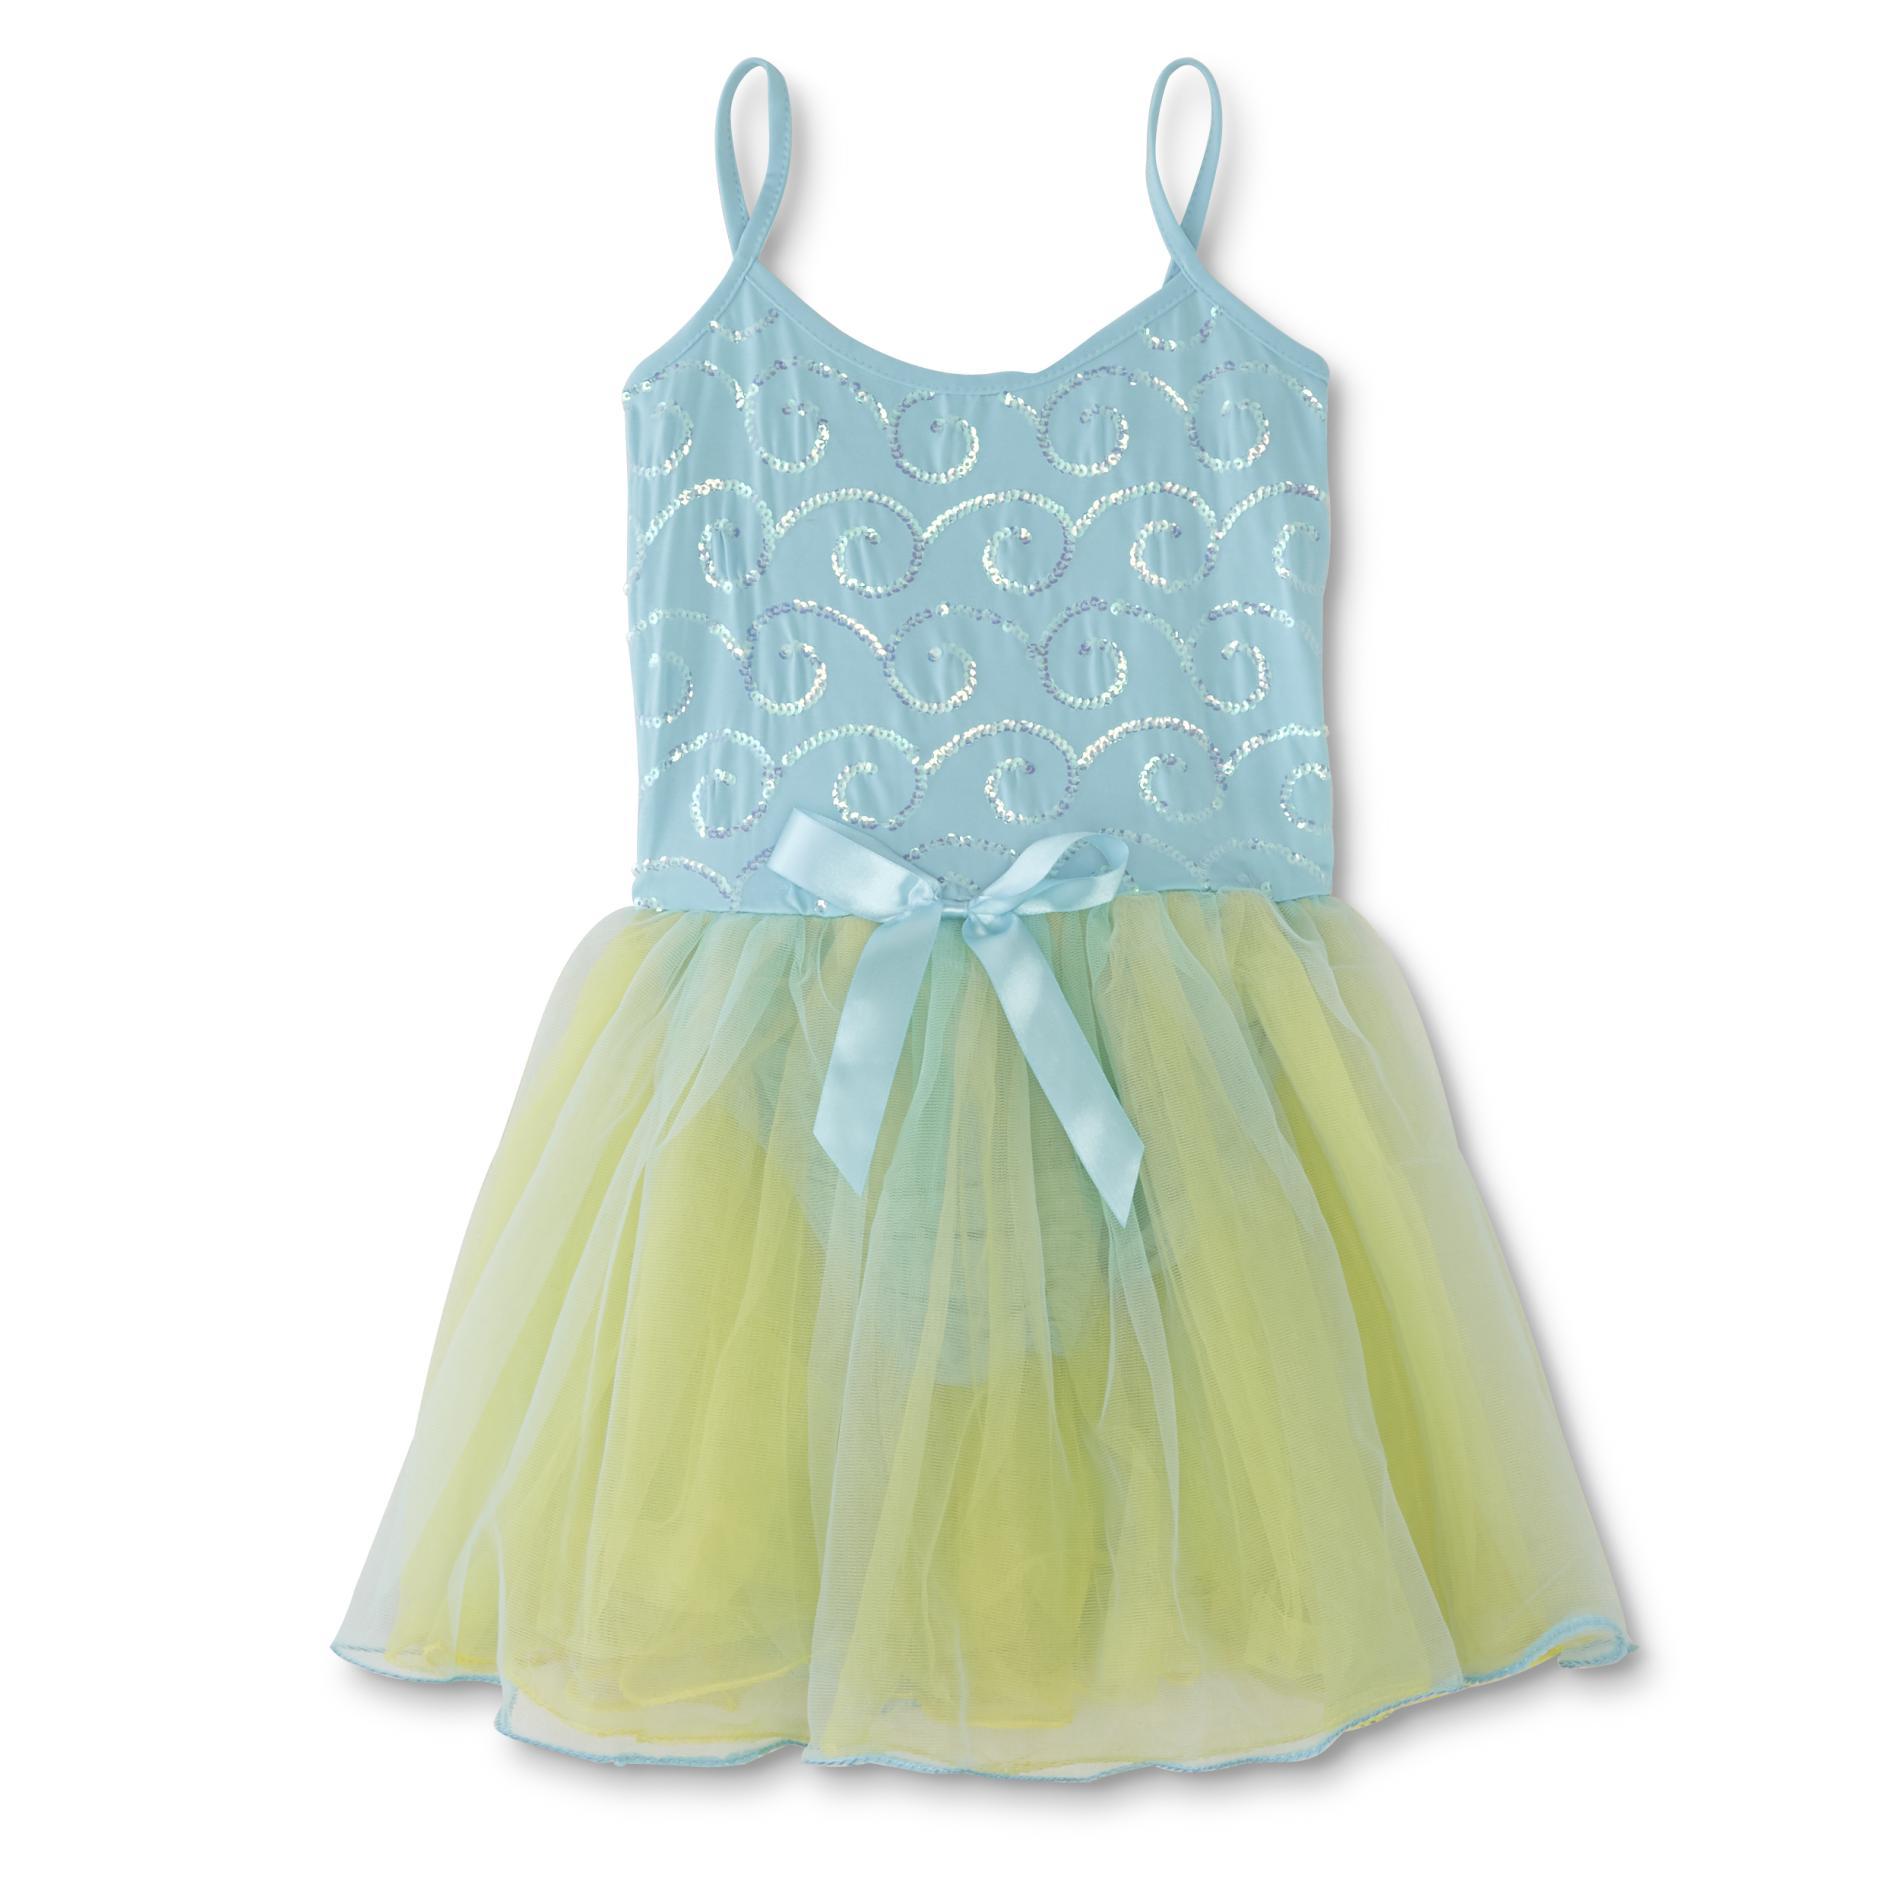 Girls' Dress-Up Princess Sequin Dress, Size: Large im test